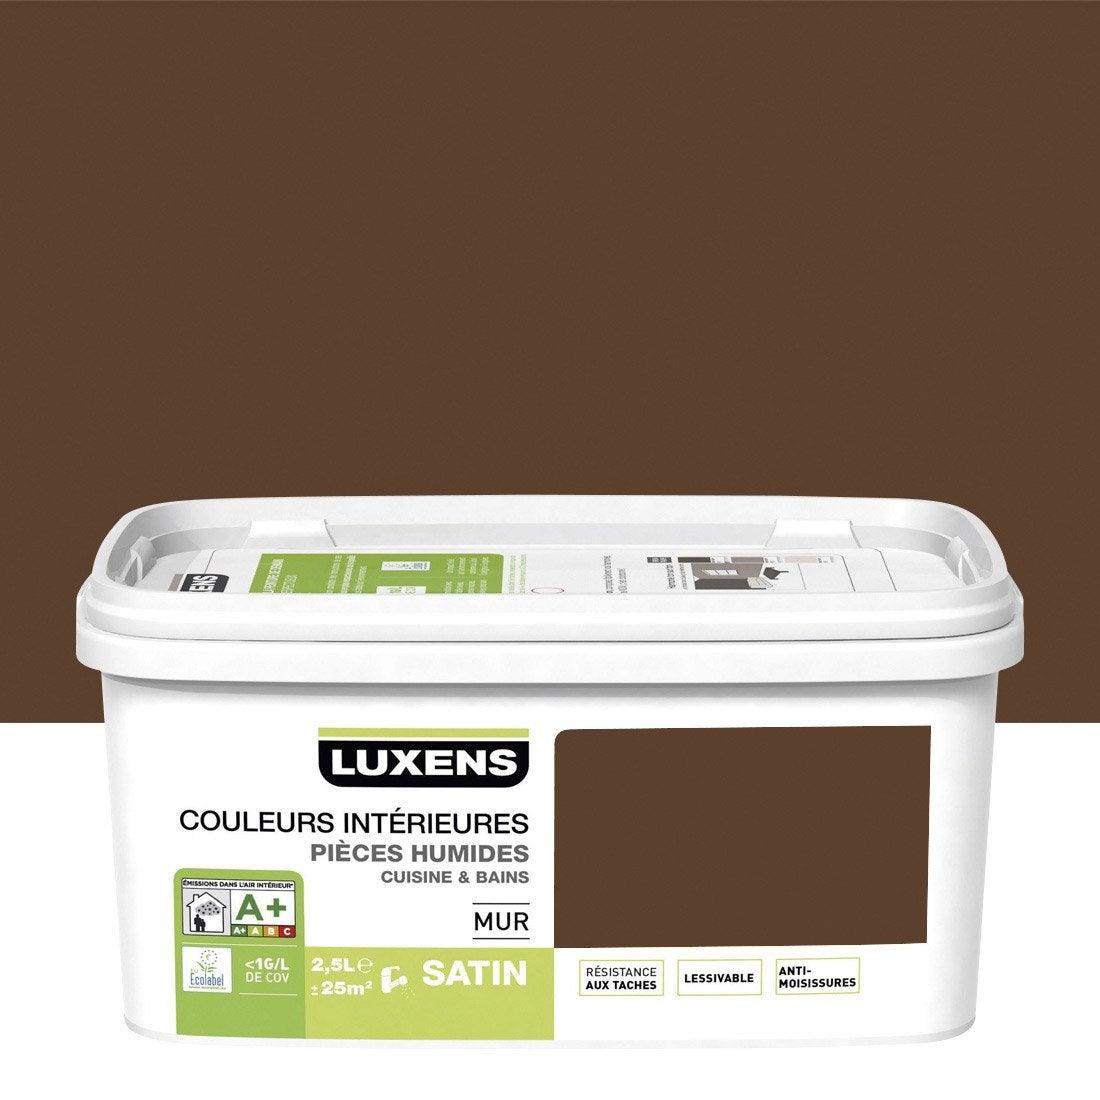 peinture couleurs int rieures luxens brun chocolat 3 2 5l leroy merlin